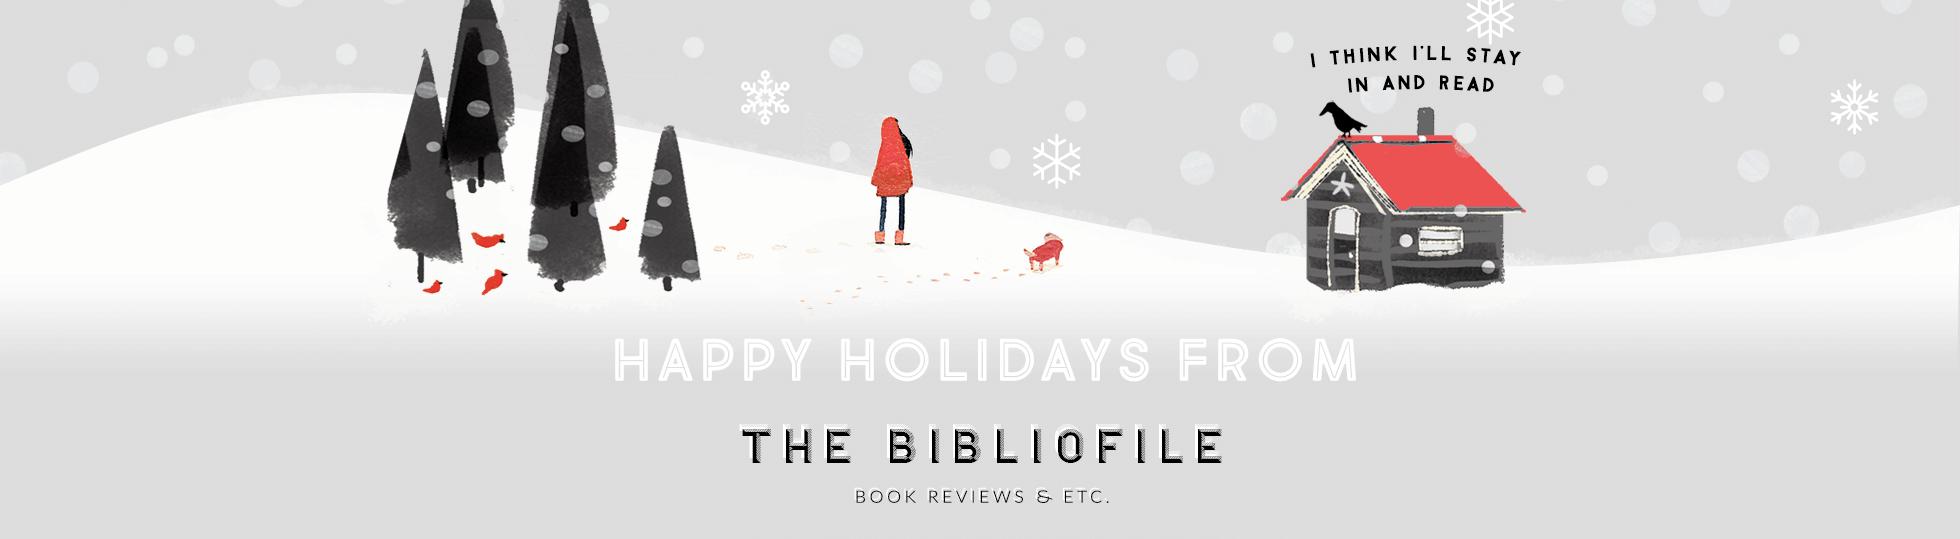 The Bibliofile